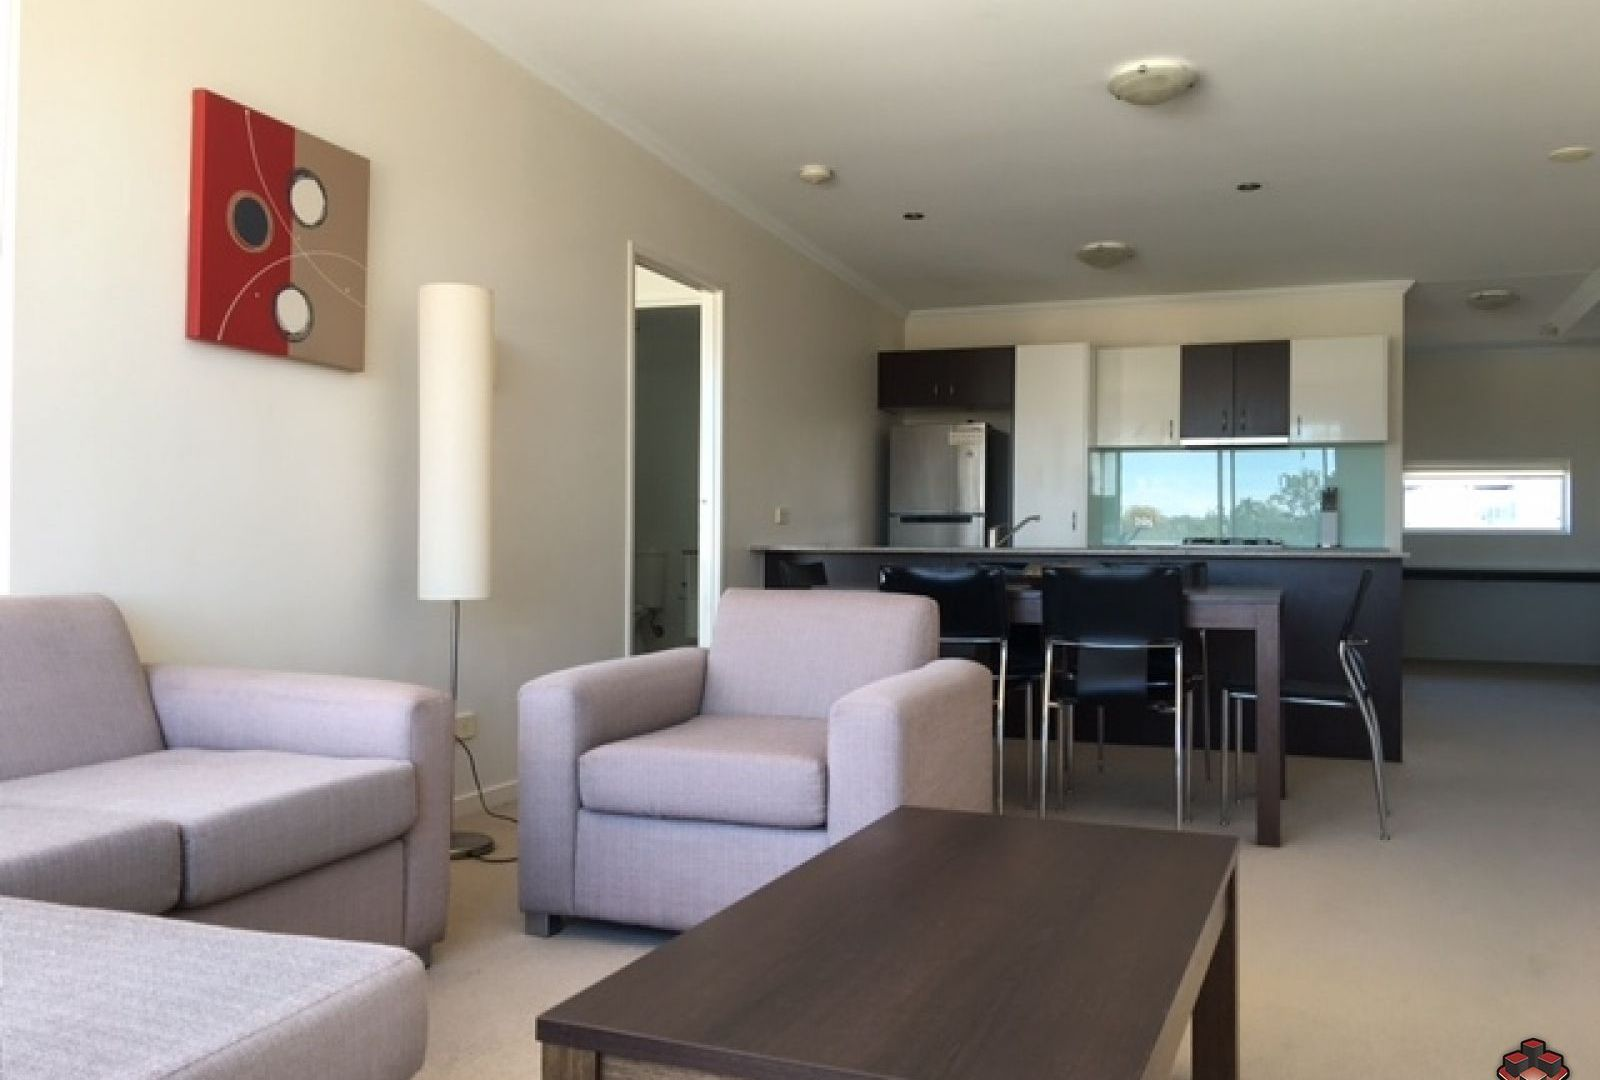 59 Keating Street, Indooroopilly QLD 4068, Image 2